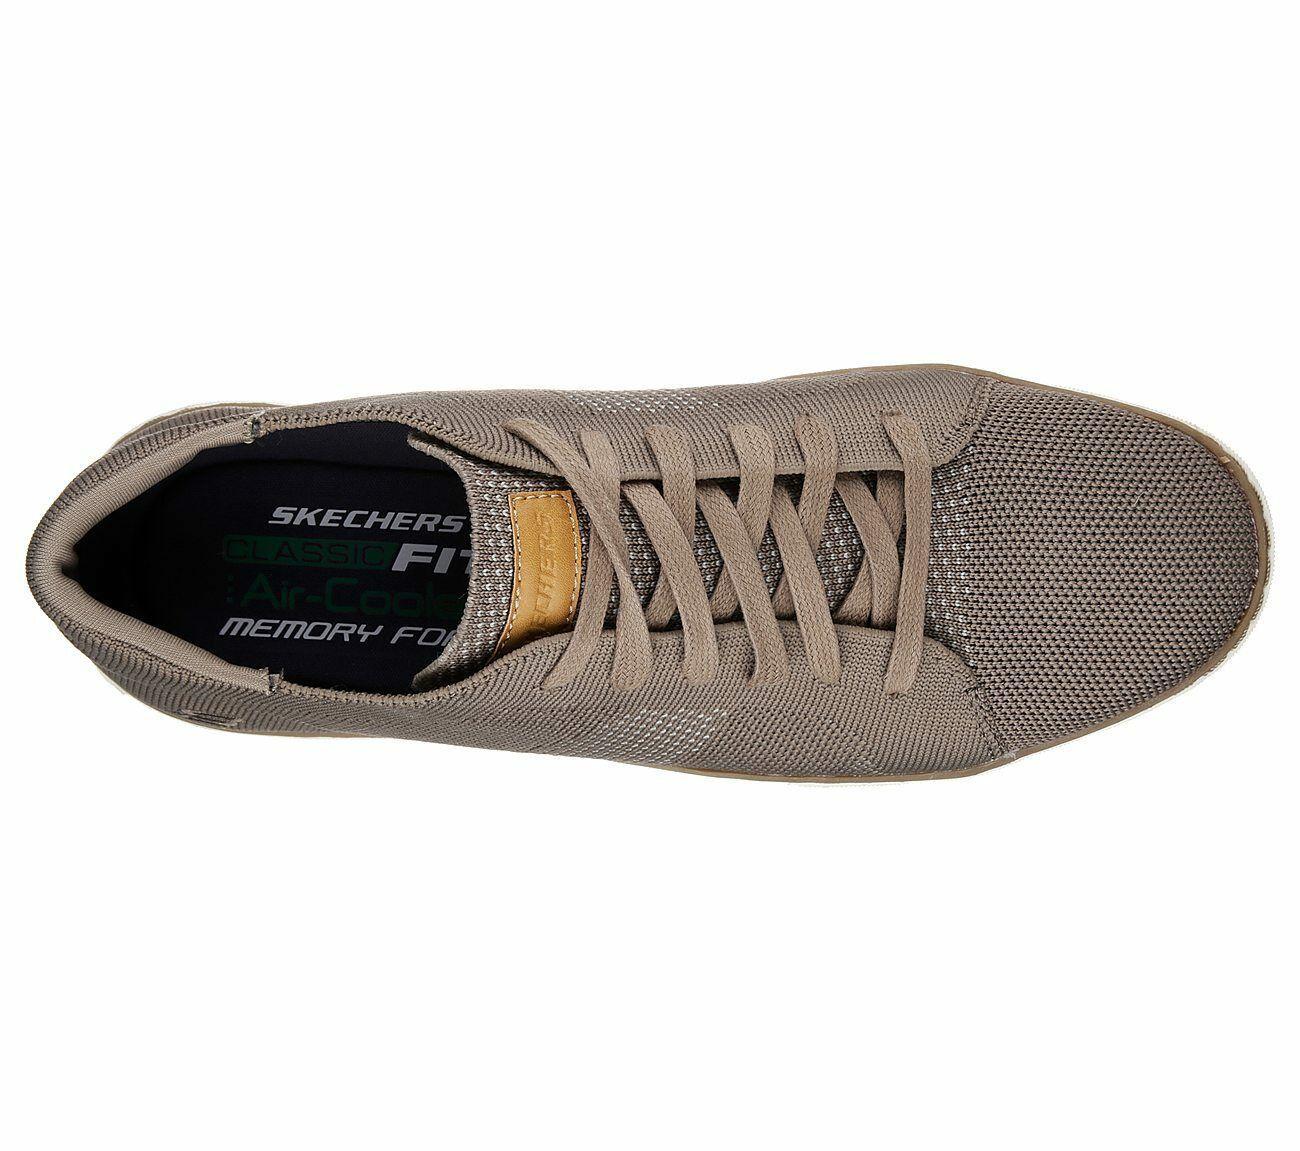 65088, SKECHERS, Lanson Revero, USA Men's Lace Up, Classic Fit, Casual Shoes image 11